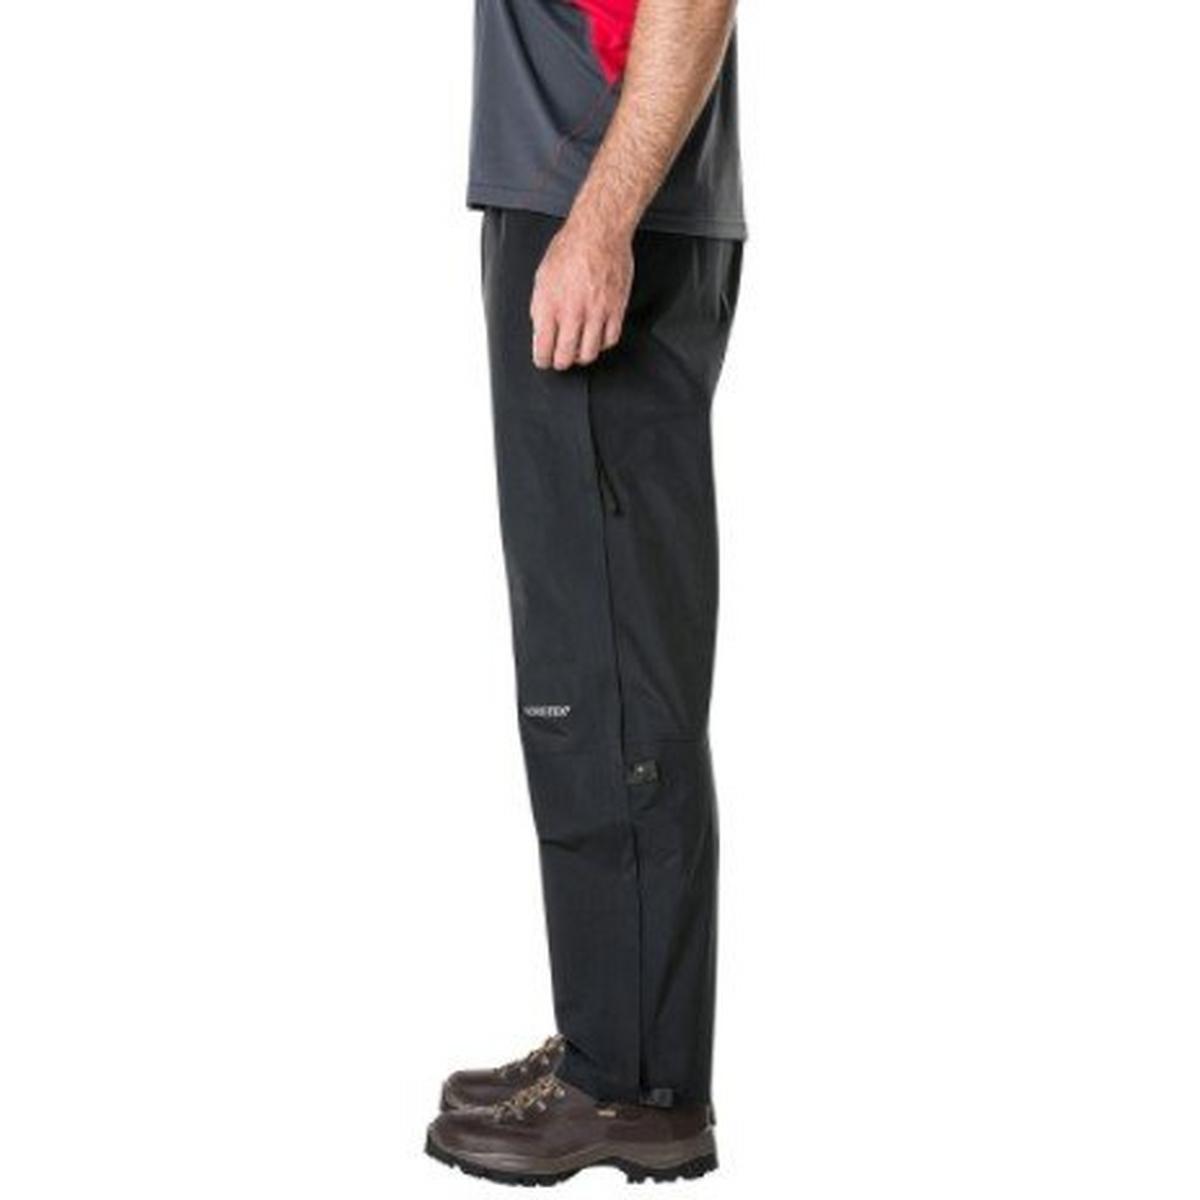 Berghaus WATERPROOF Overtrousers Men's Gore-Tex Paclite Pant LONG Leg Black